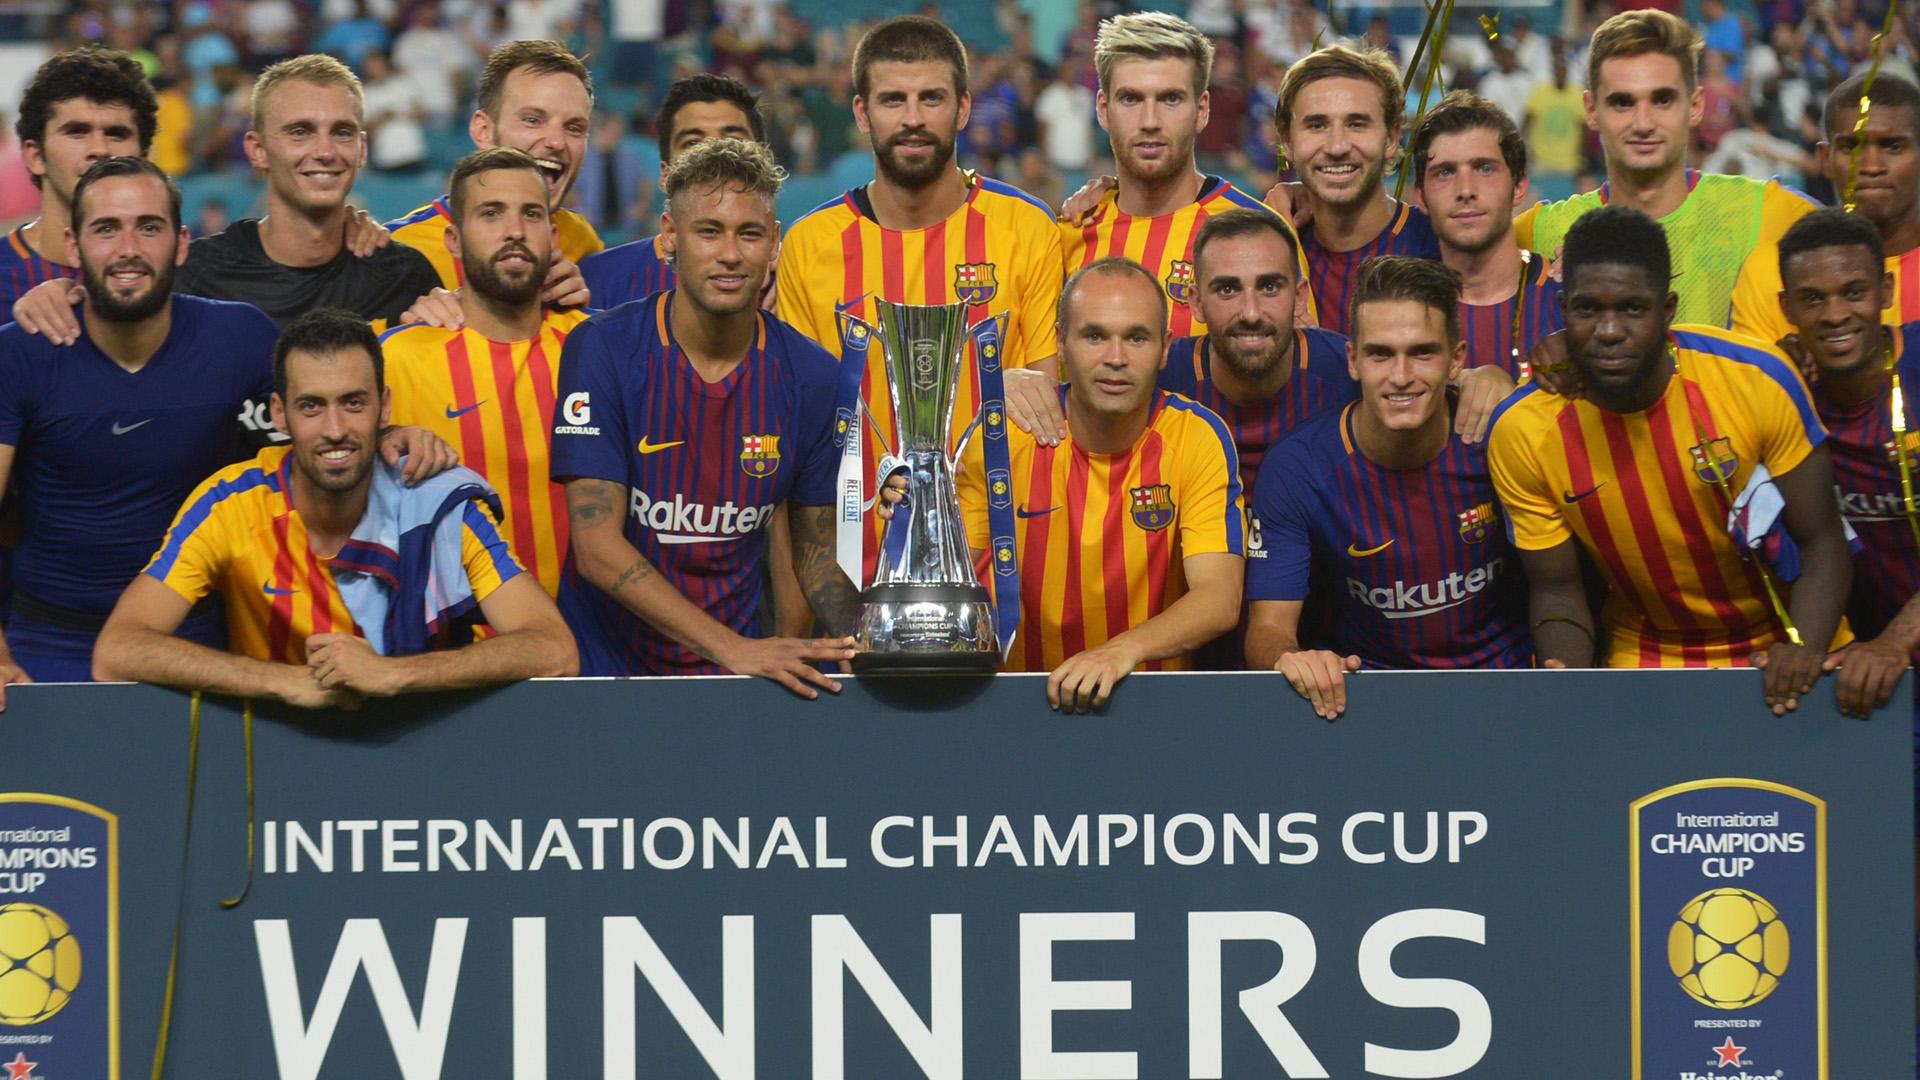 ICC 2017 Barcelona